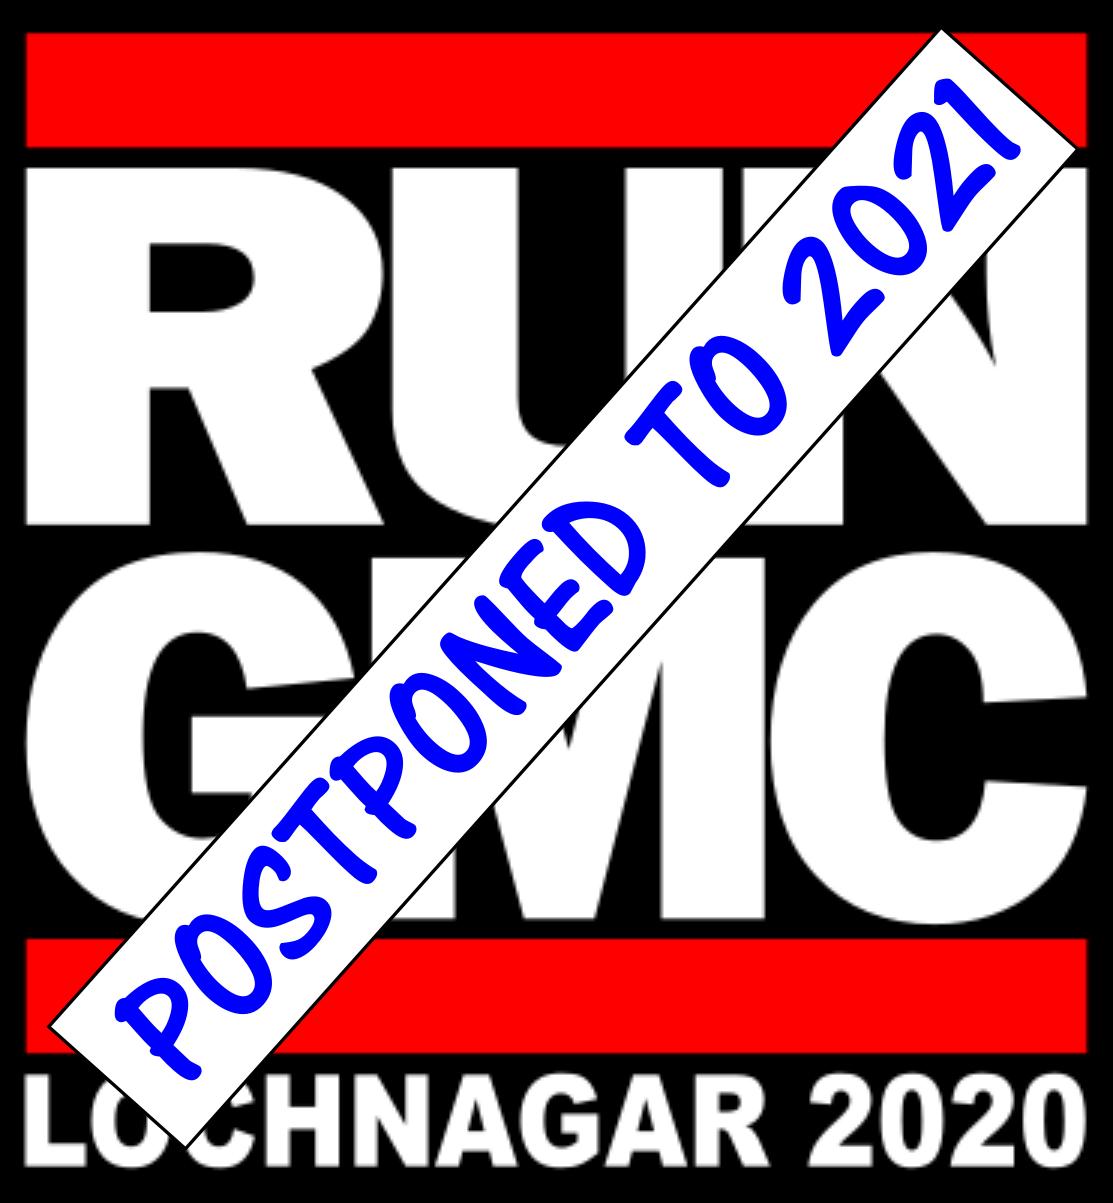 GMC 2020 logo potponed